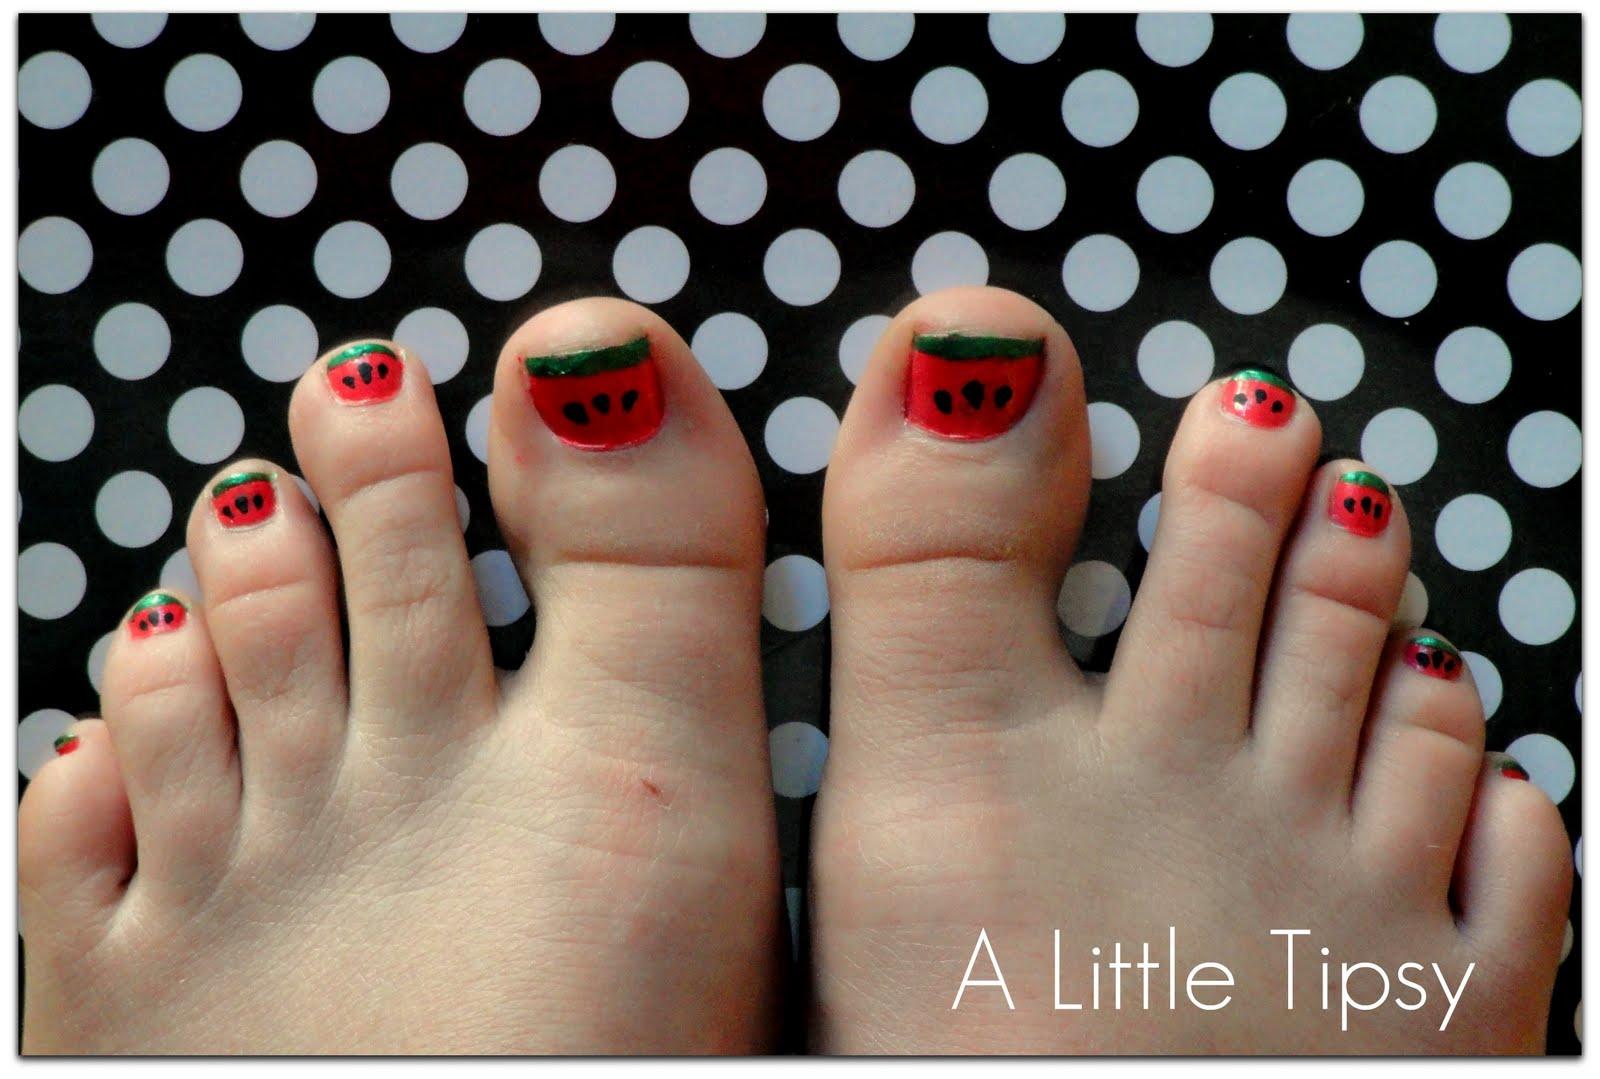 DIY Under $5 {Watermelon Toenails} - A Little Tipsy